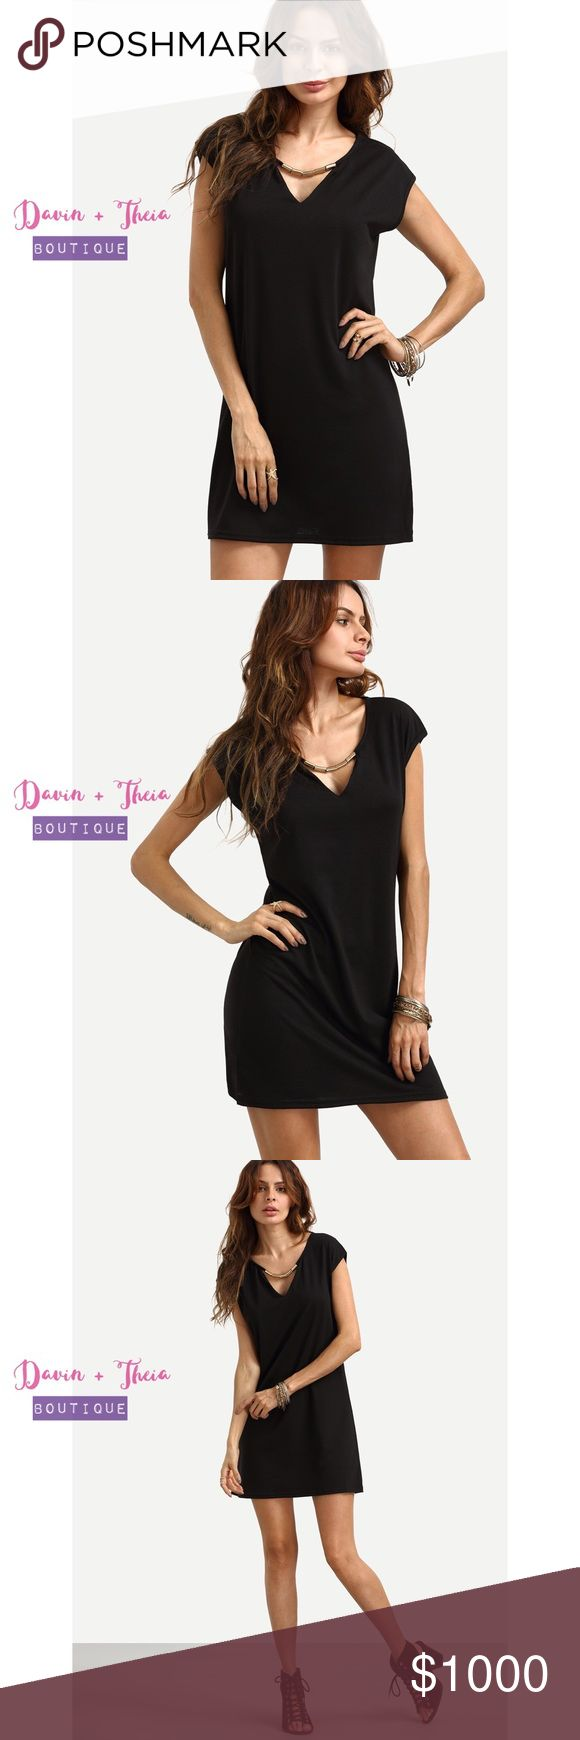 ‼️24-HR SALE‼️🌟Black V Neck Shift Dress🌟 Casual style Black V Neck Shift Dress. Material is cotton blend. Limited quantity, only have 1 for each size.  Approximate Measurement: Shoulder: S:46cm, M:47cm, L:48cm, XL:49cm Bust: S:96cm, M:100cm, L:104cm, XL:108cm Waist Size: S:84cm, M:88cm, L:92cm, XL:96cm Length: S:81cm, M:82cm, L:83cm, XL:84cm  💟PRICE is FIRM 💟NO Trades Davin+Theia Dresses